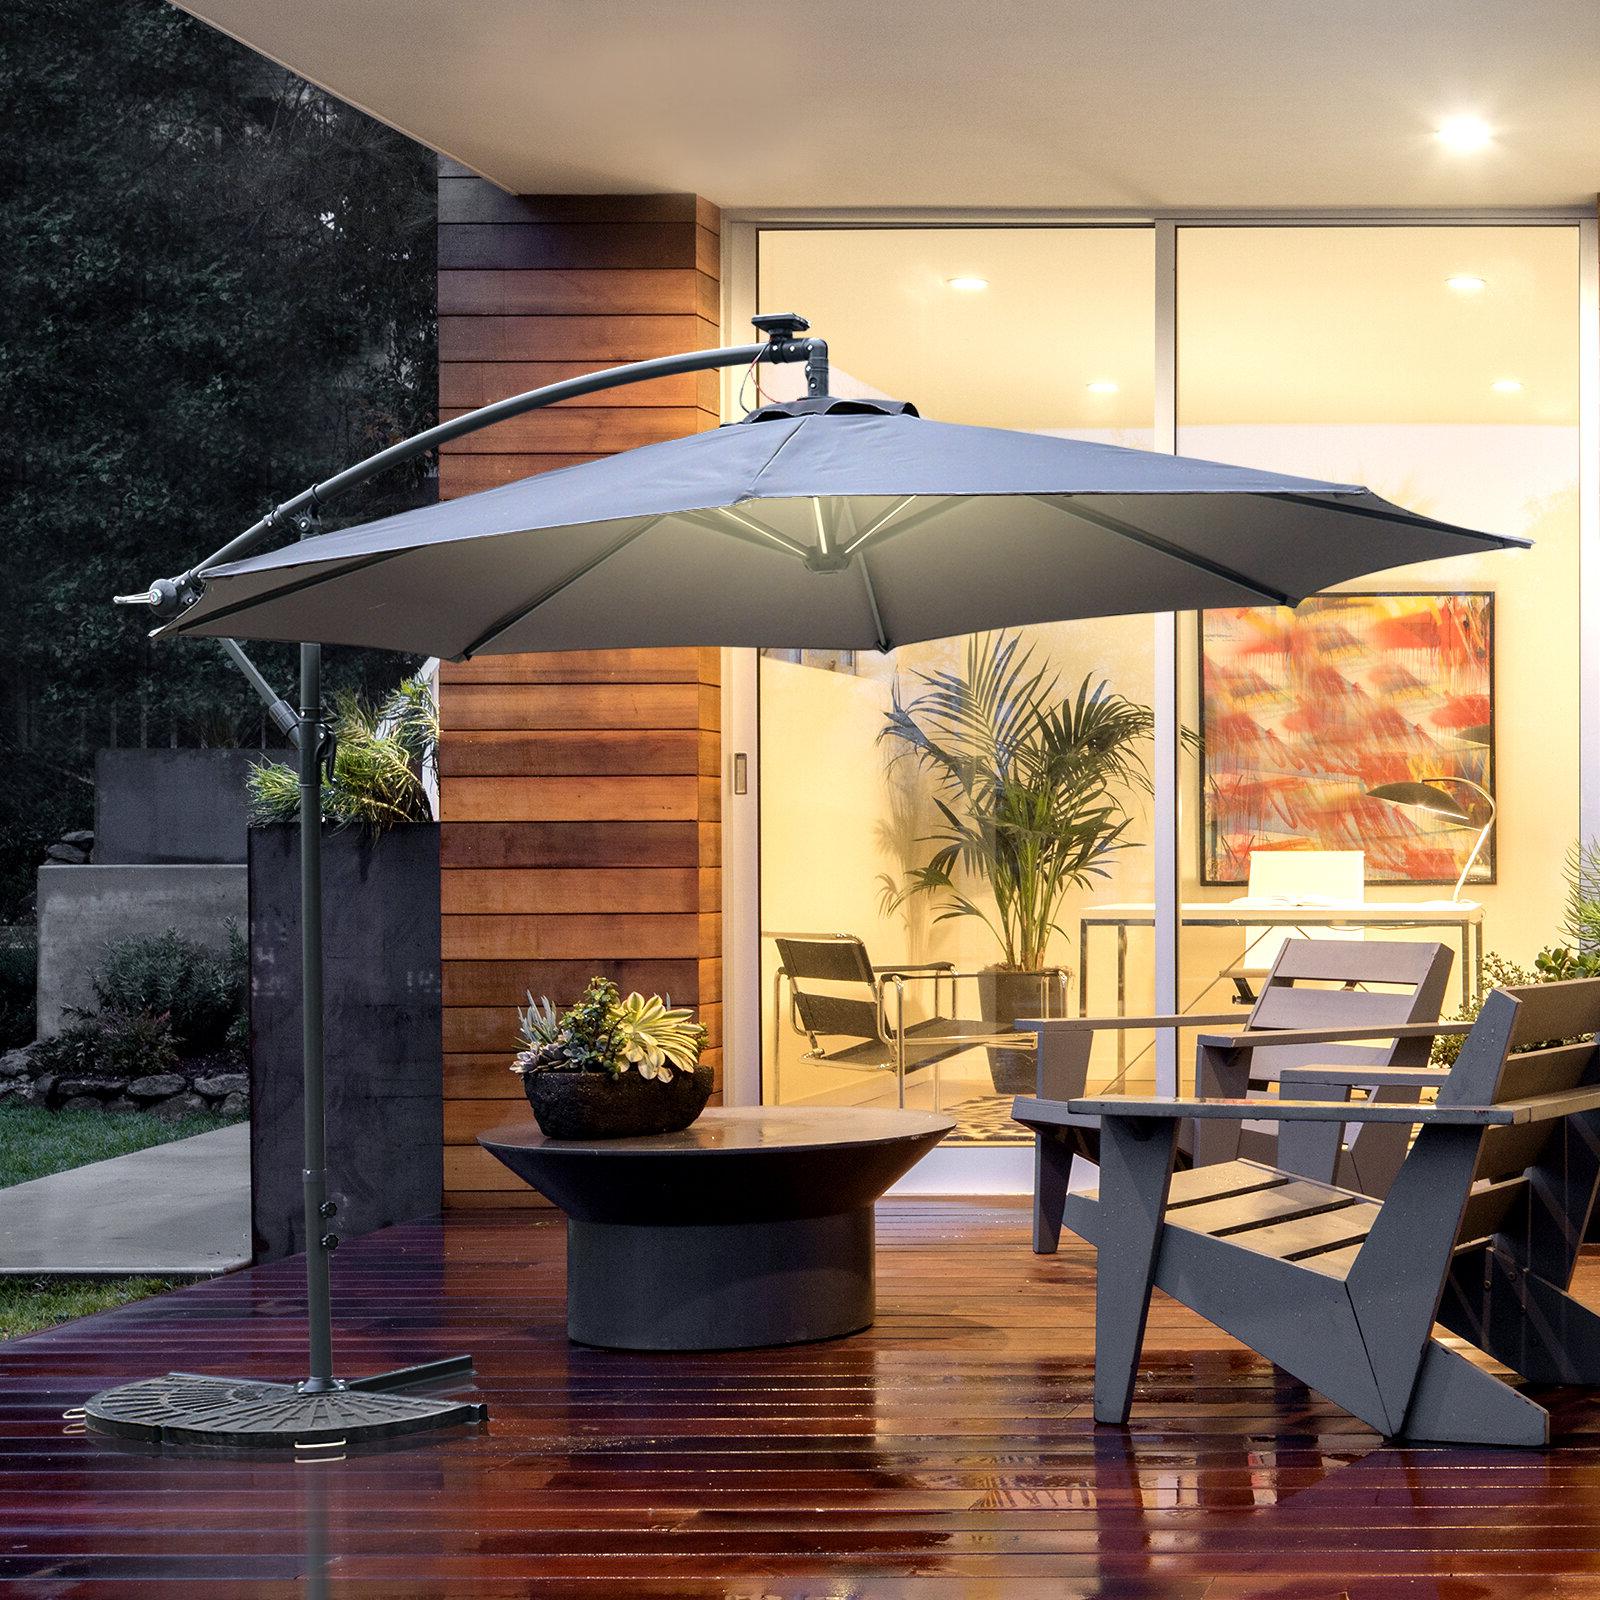 Haverhill Umbrellas For Popular Stamford 10' Cantilever Umbrella (Gallery 14 of 20)